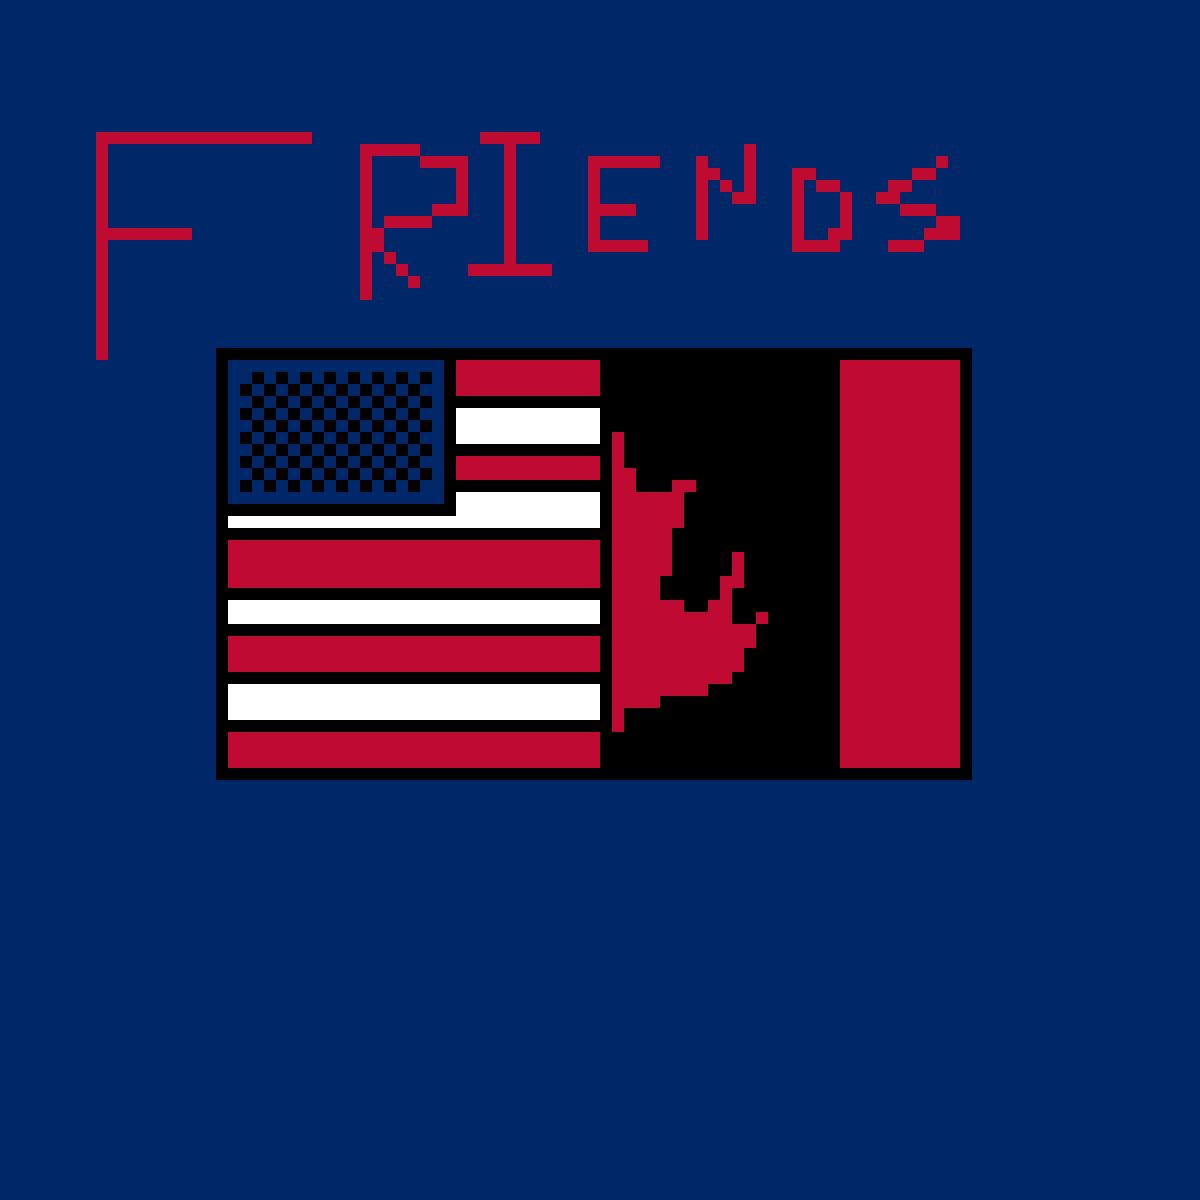 Canadamerica